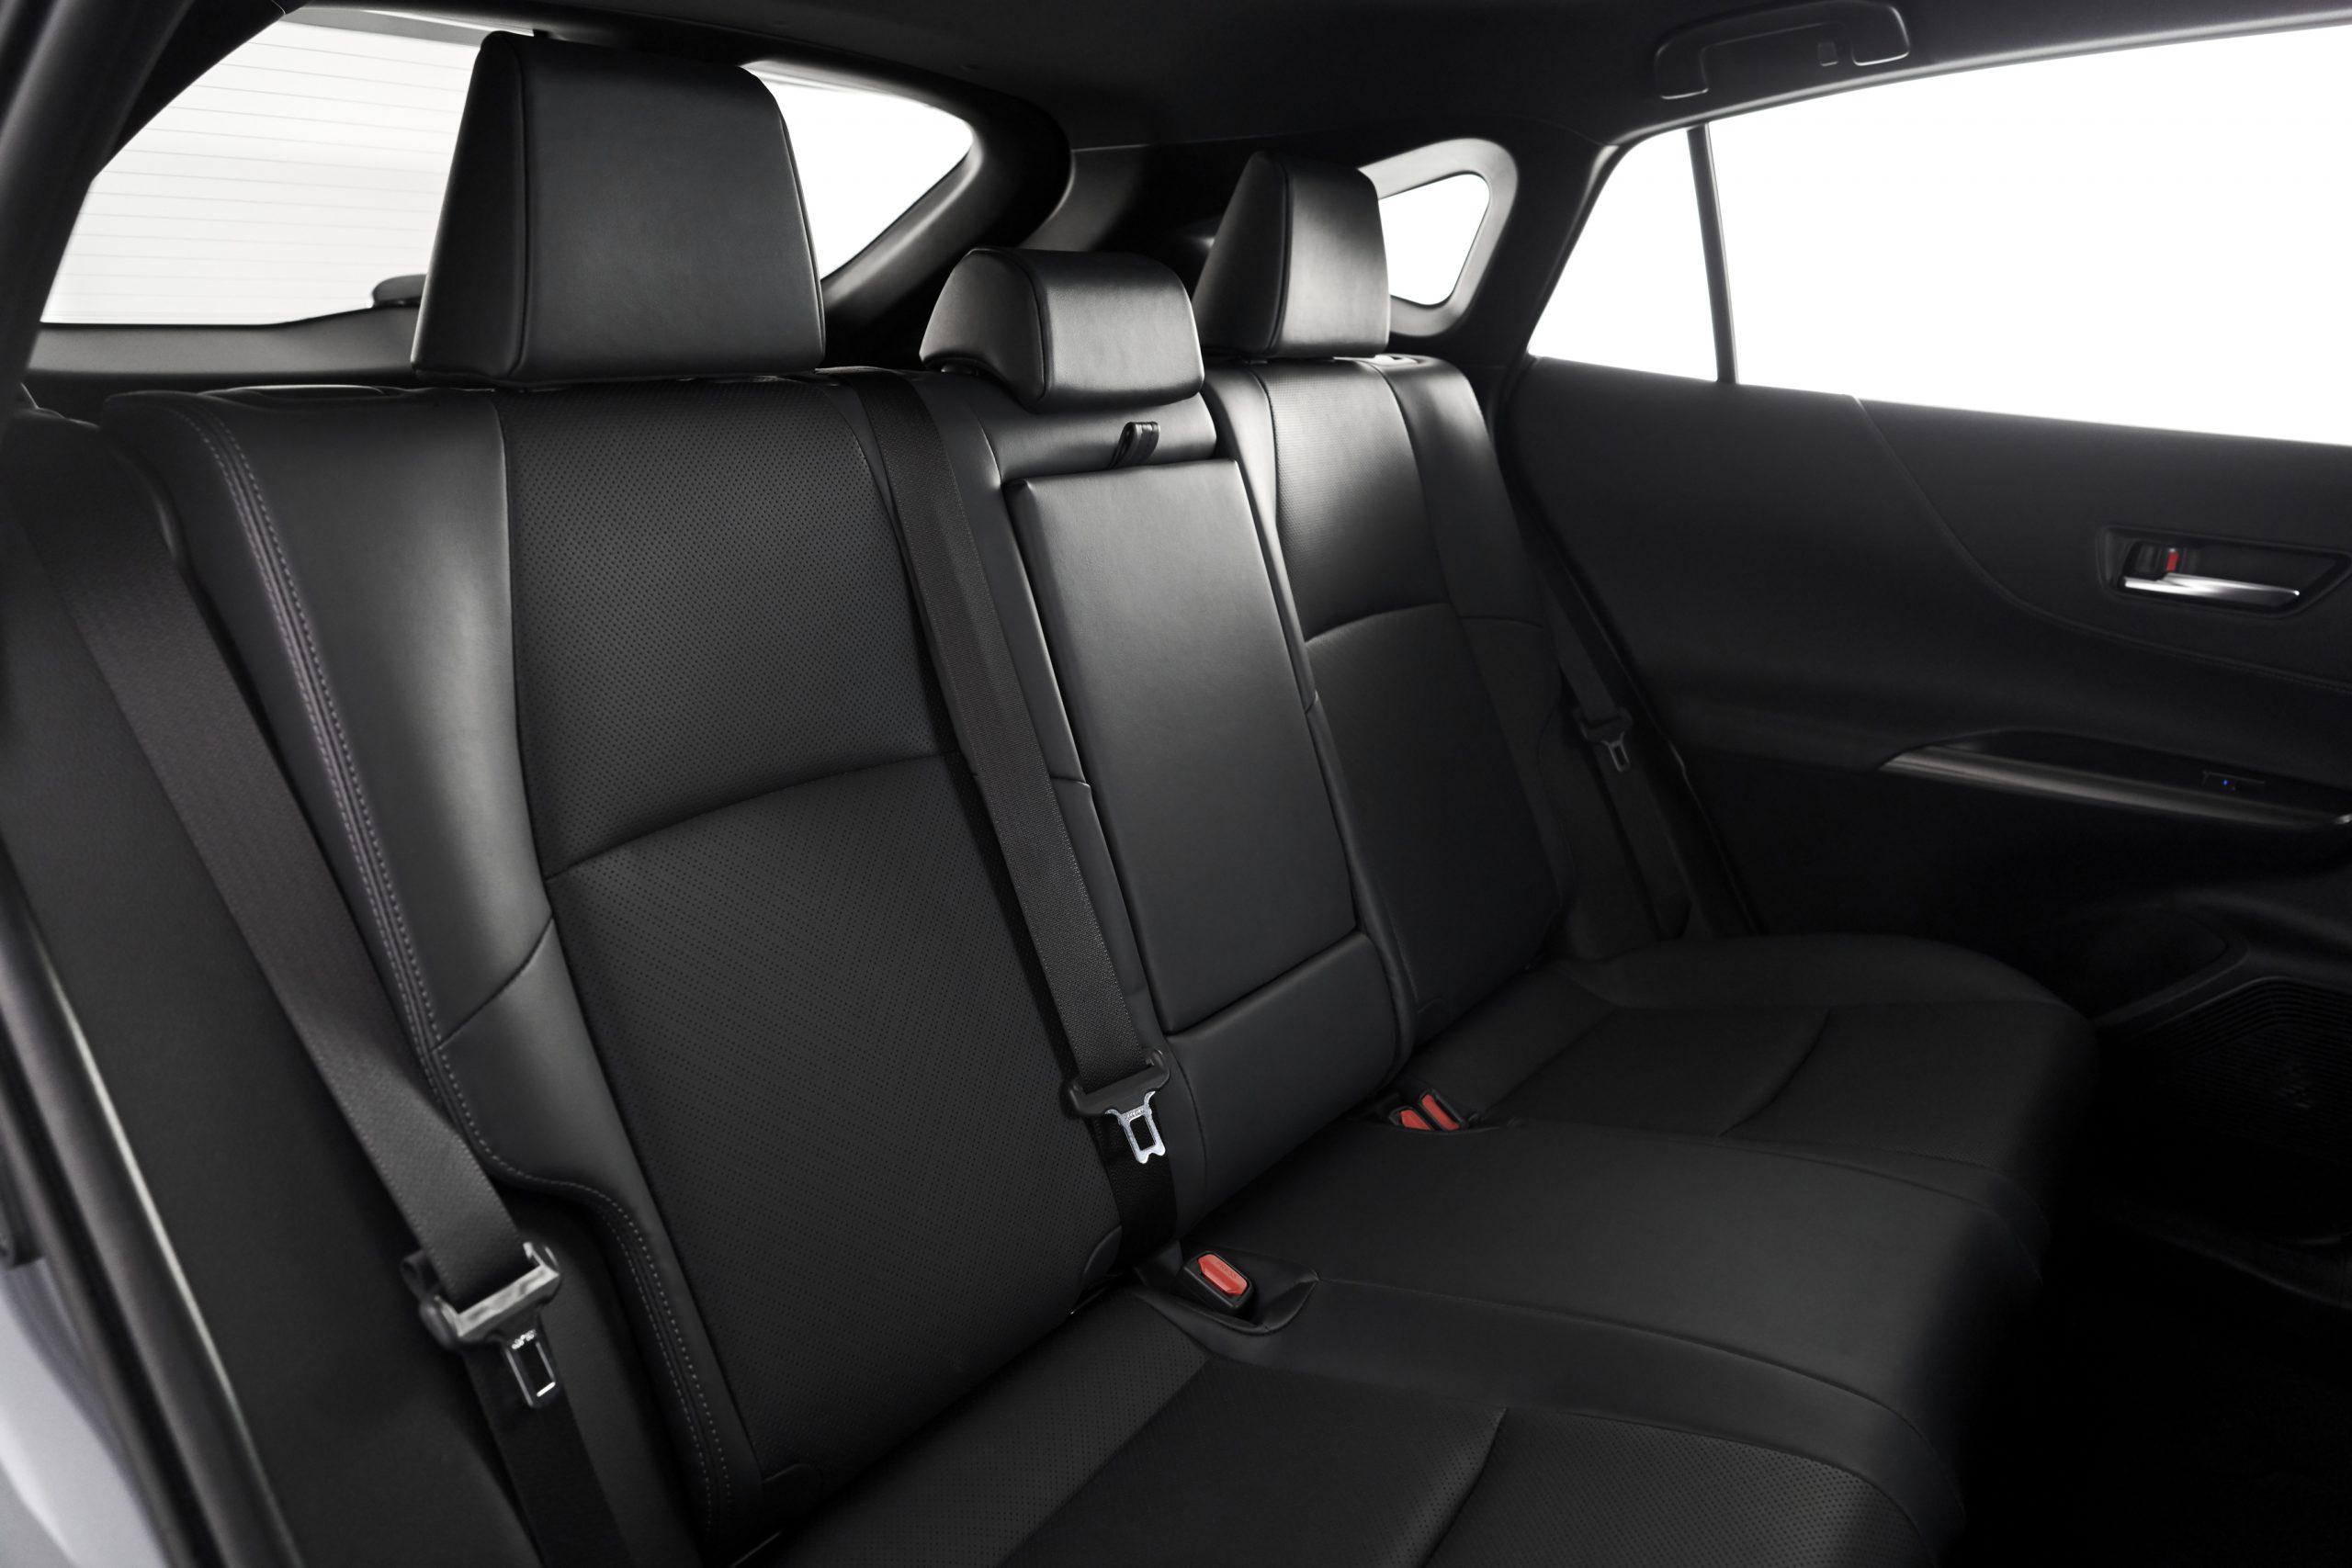 2021-Toyota-Venza_Interior_011-scaled.jpg